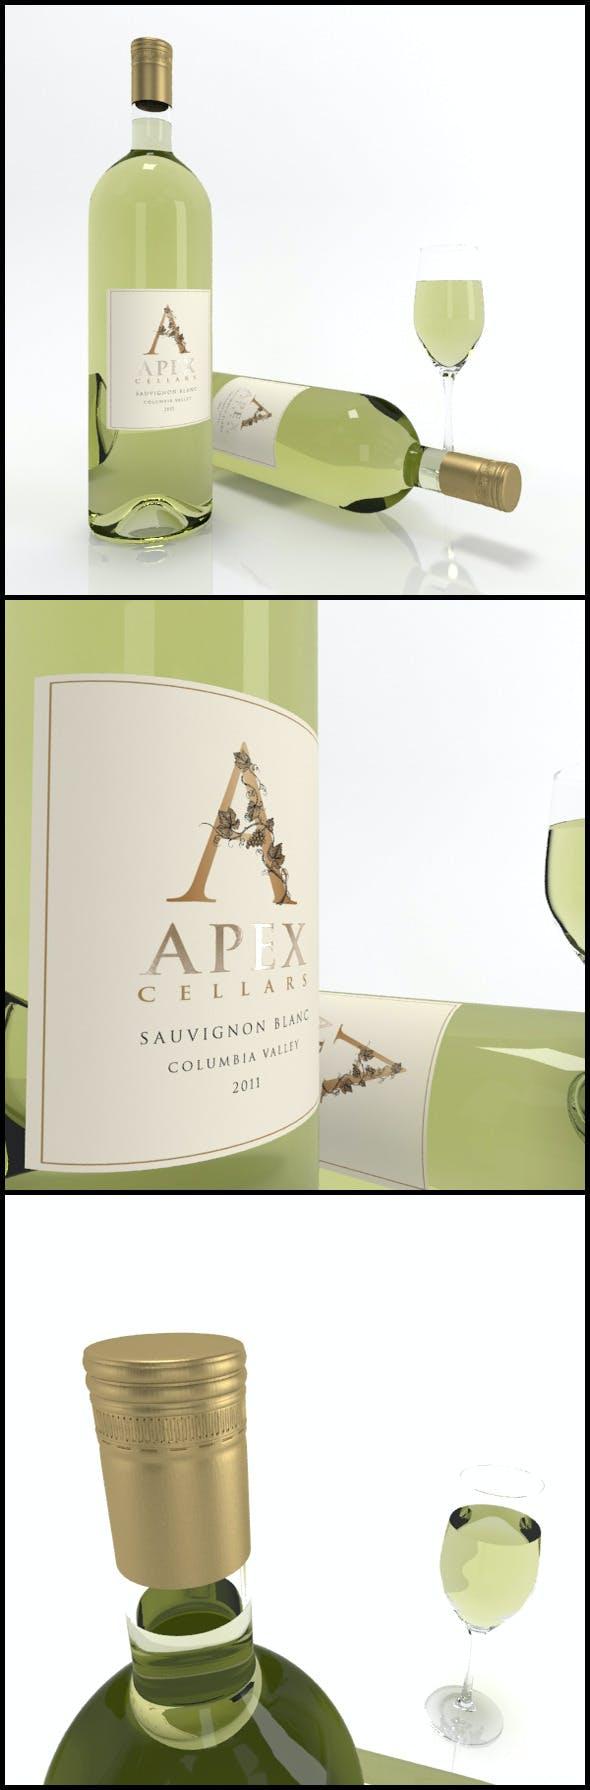 Sauvignon Blanc wine bottles & full glass: Apex - 3DOcean Item for Sale